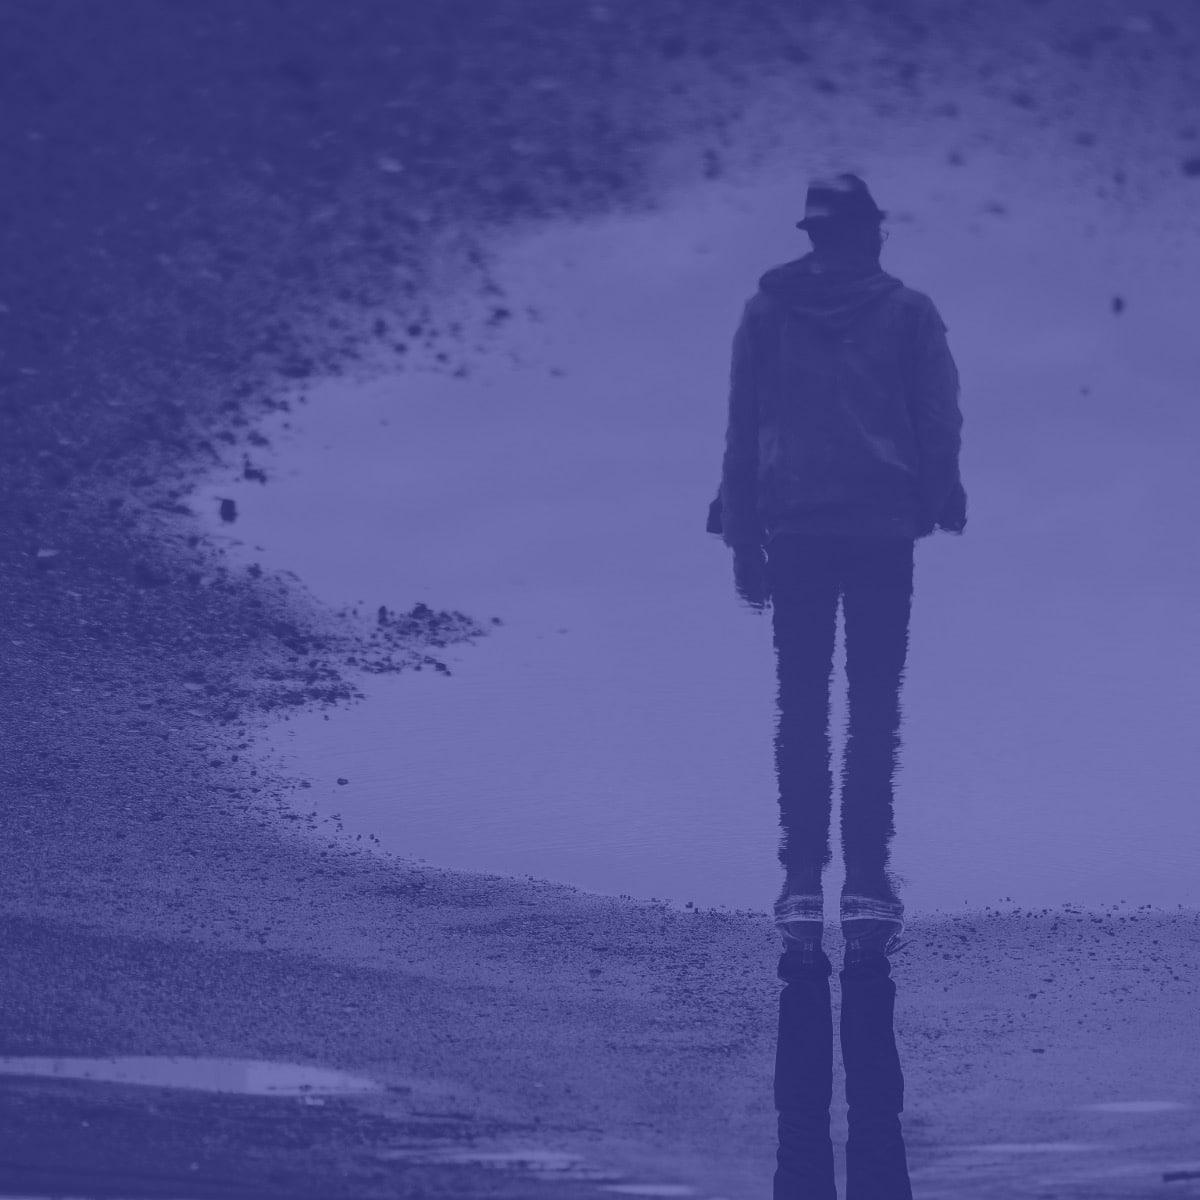 Reflection man